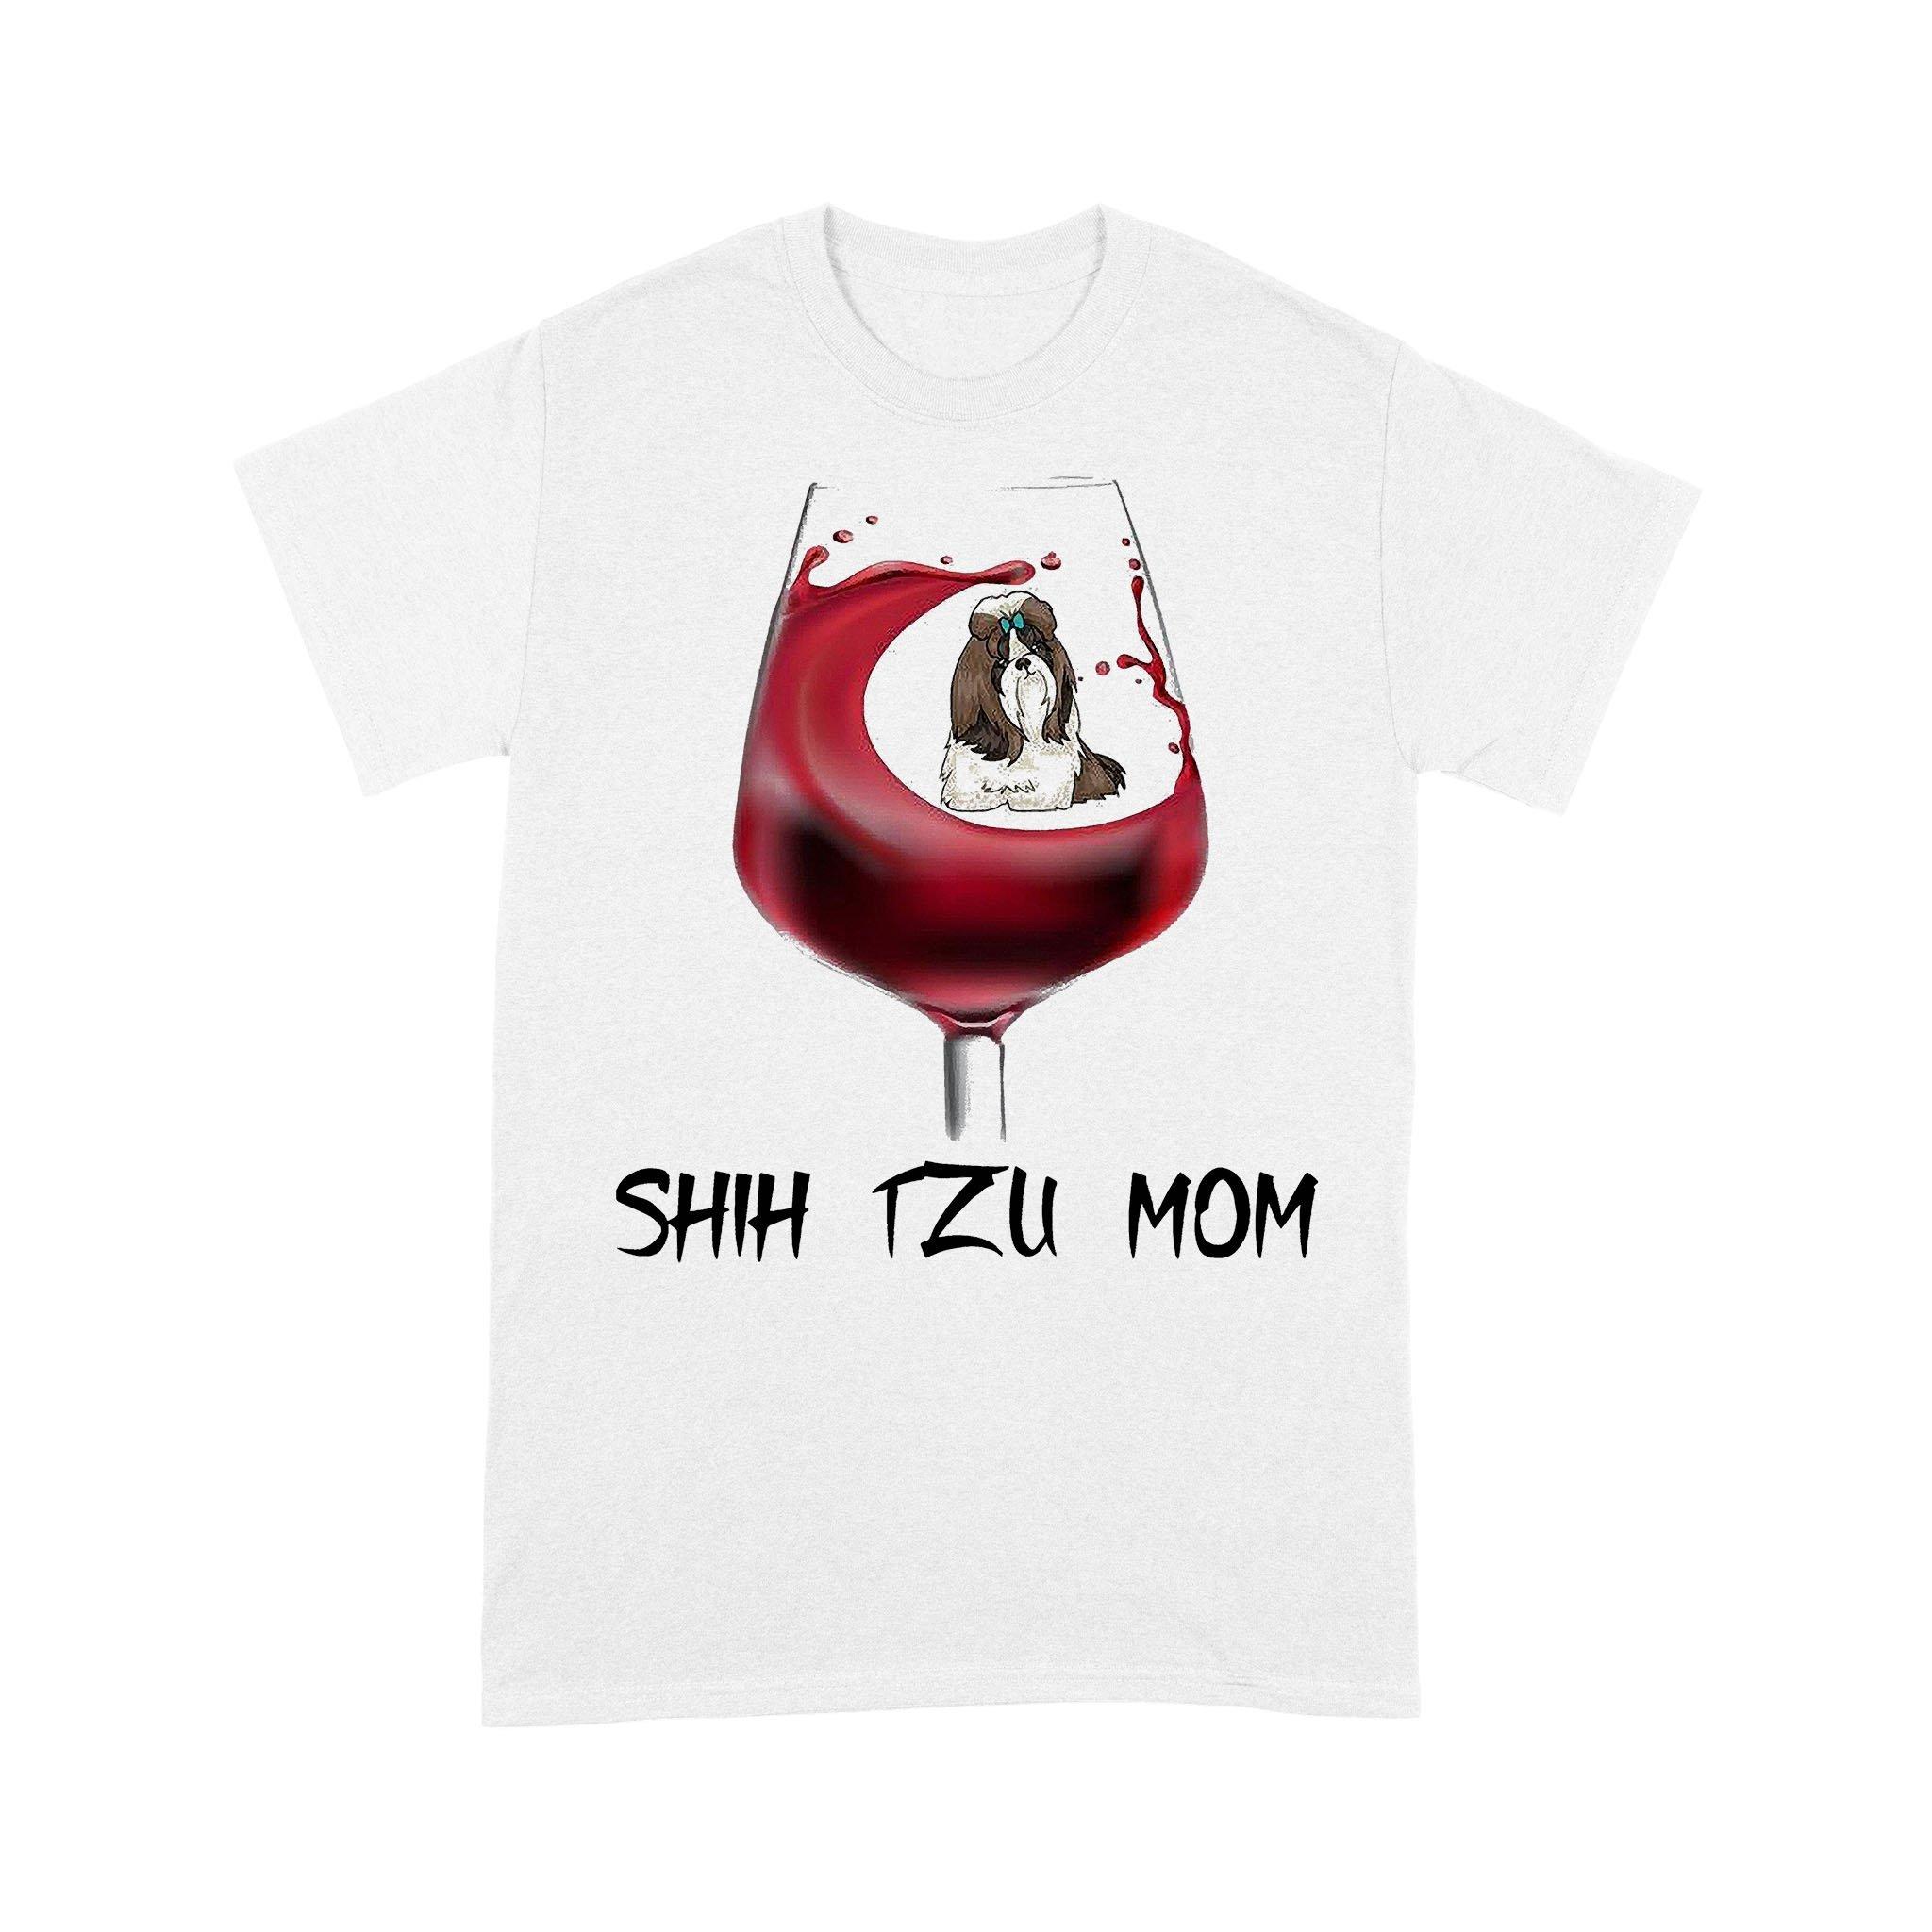 Shih Tzu Mom In Wine T-shirt